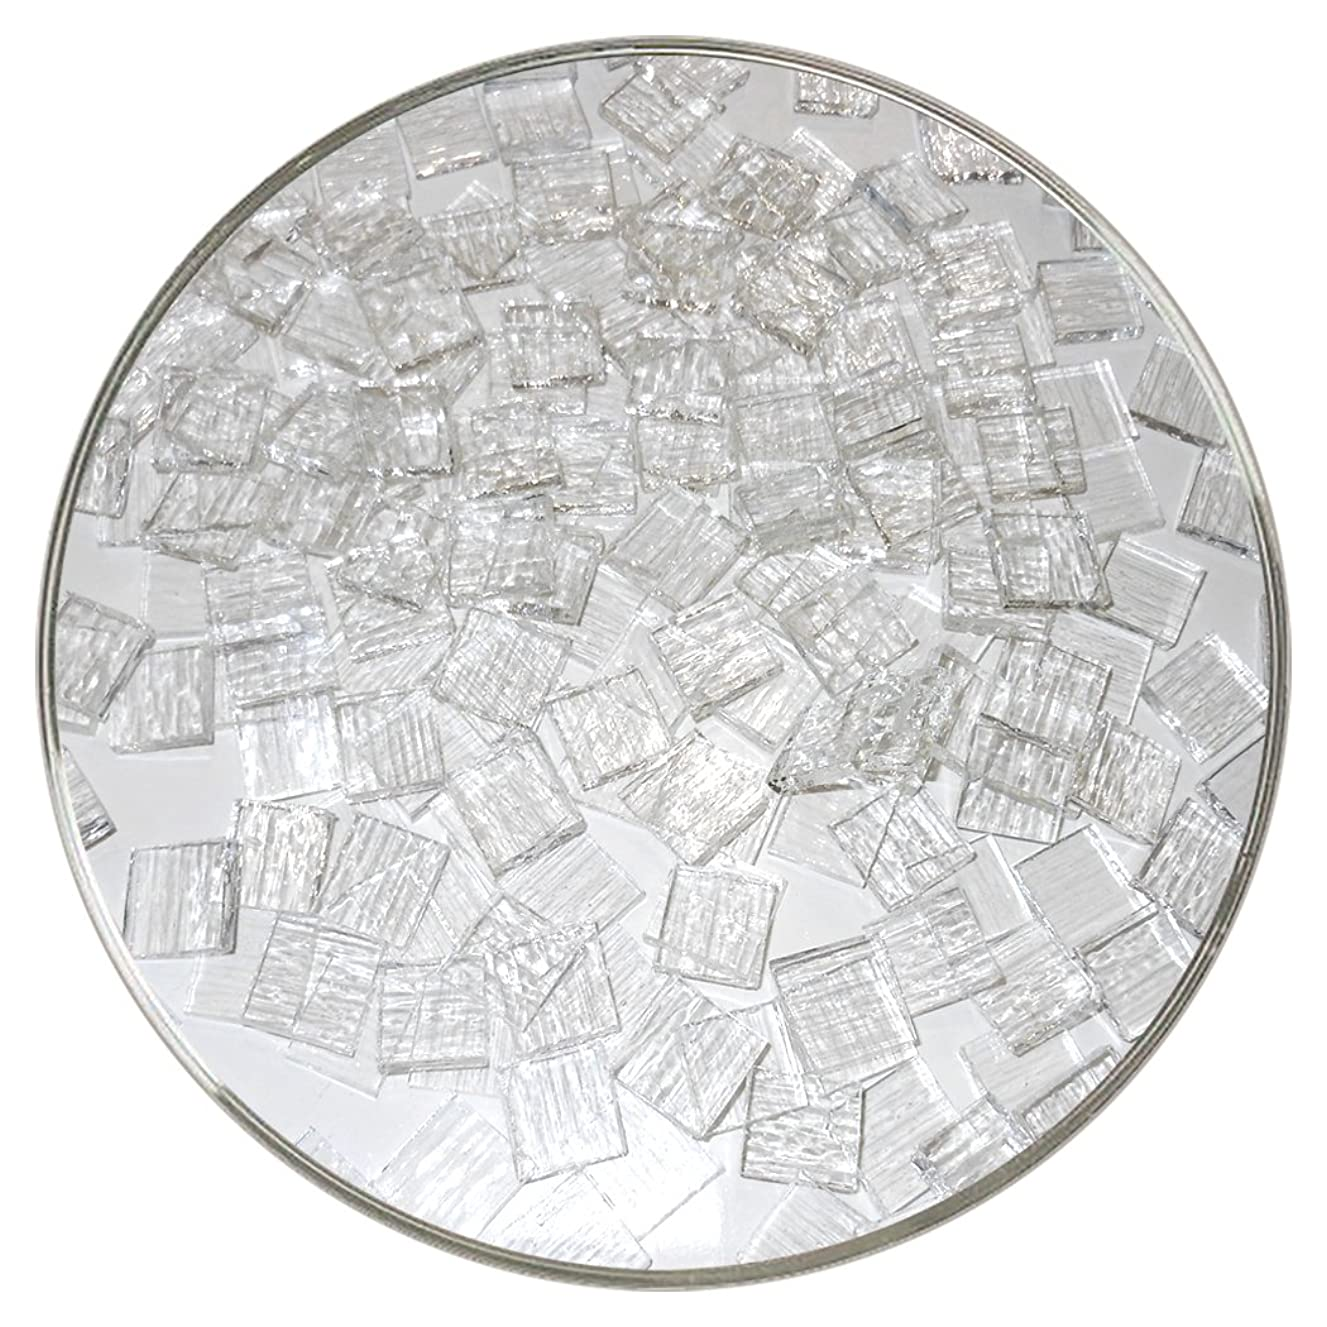 Pre-Cut Nips Clear Transparent Tekta, 90 COE, 1/4 lb - Made from Bullseye Glass